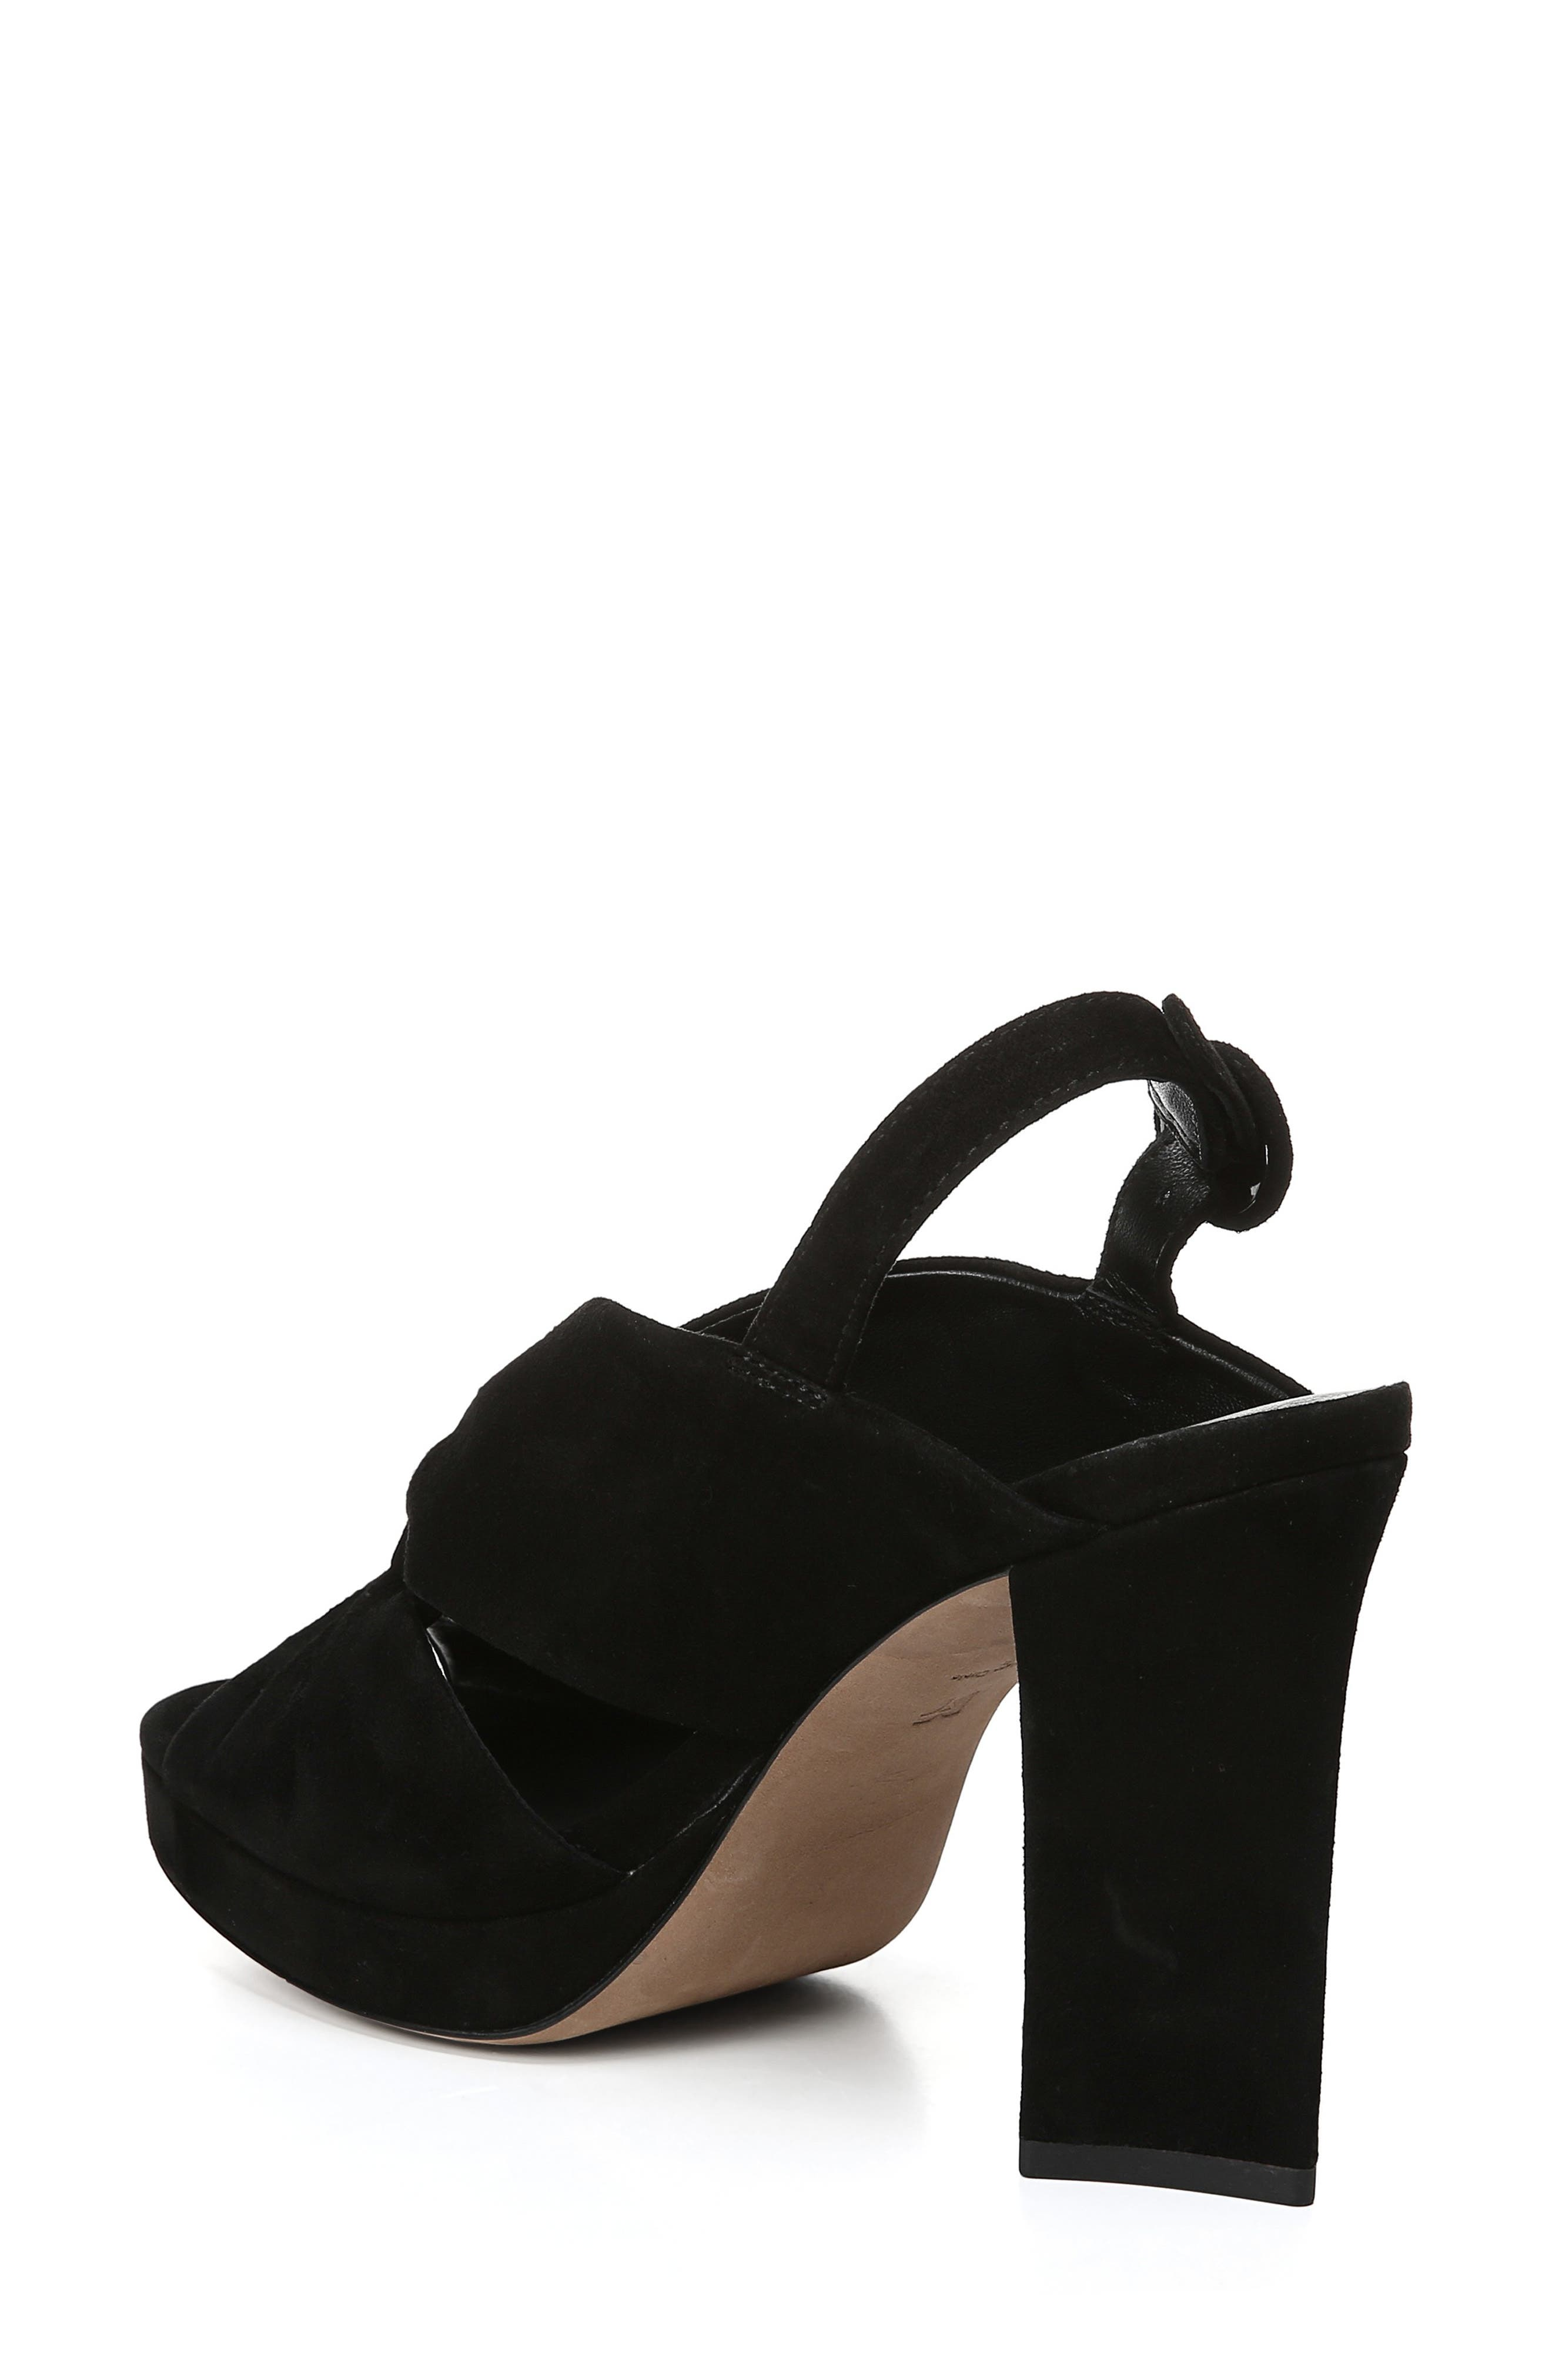 DIANE VON FURSTENBERG, Heidi Platform Sandal, Alternate thumbnail 2, color, BLACK